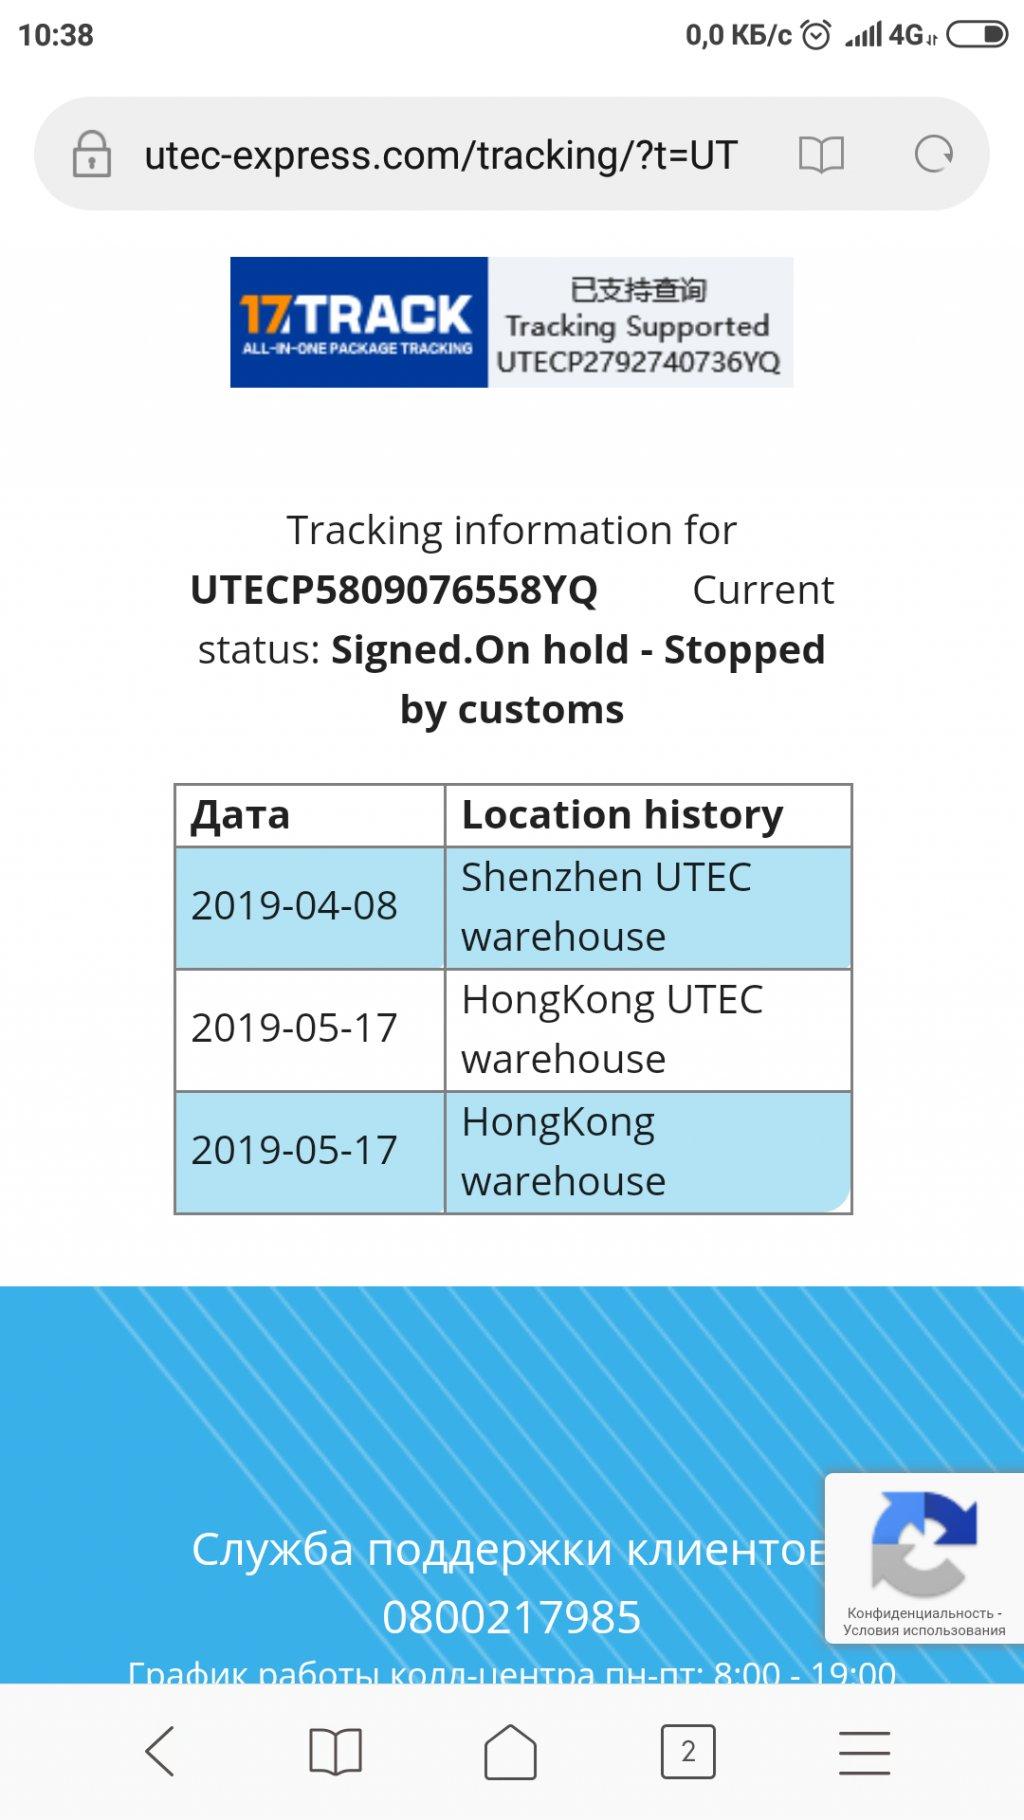 UTEC Express - UTECP5809076558YQ